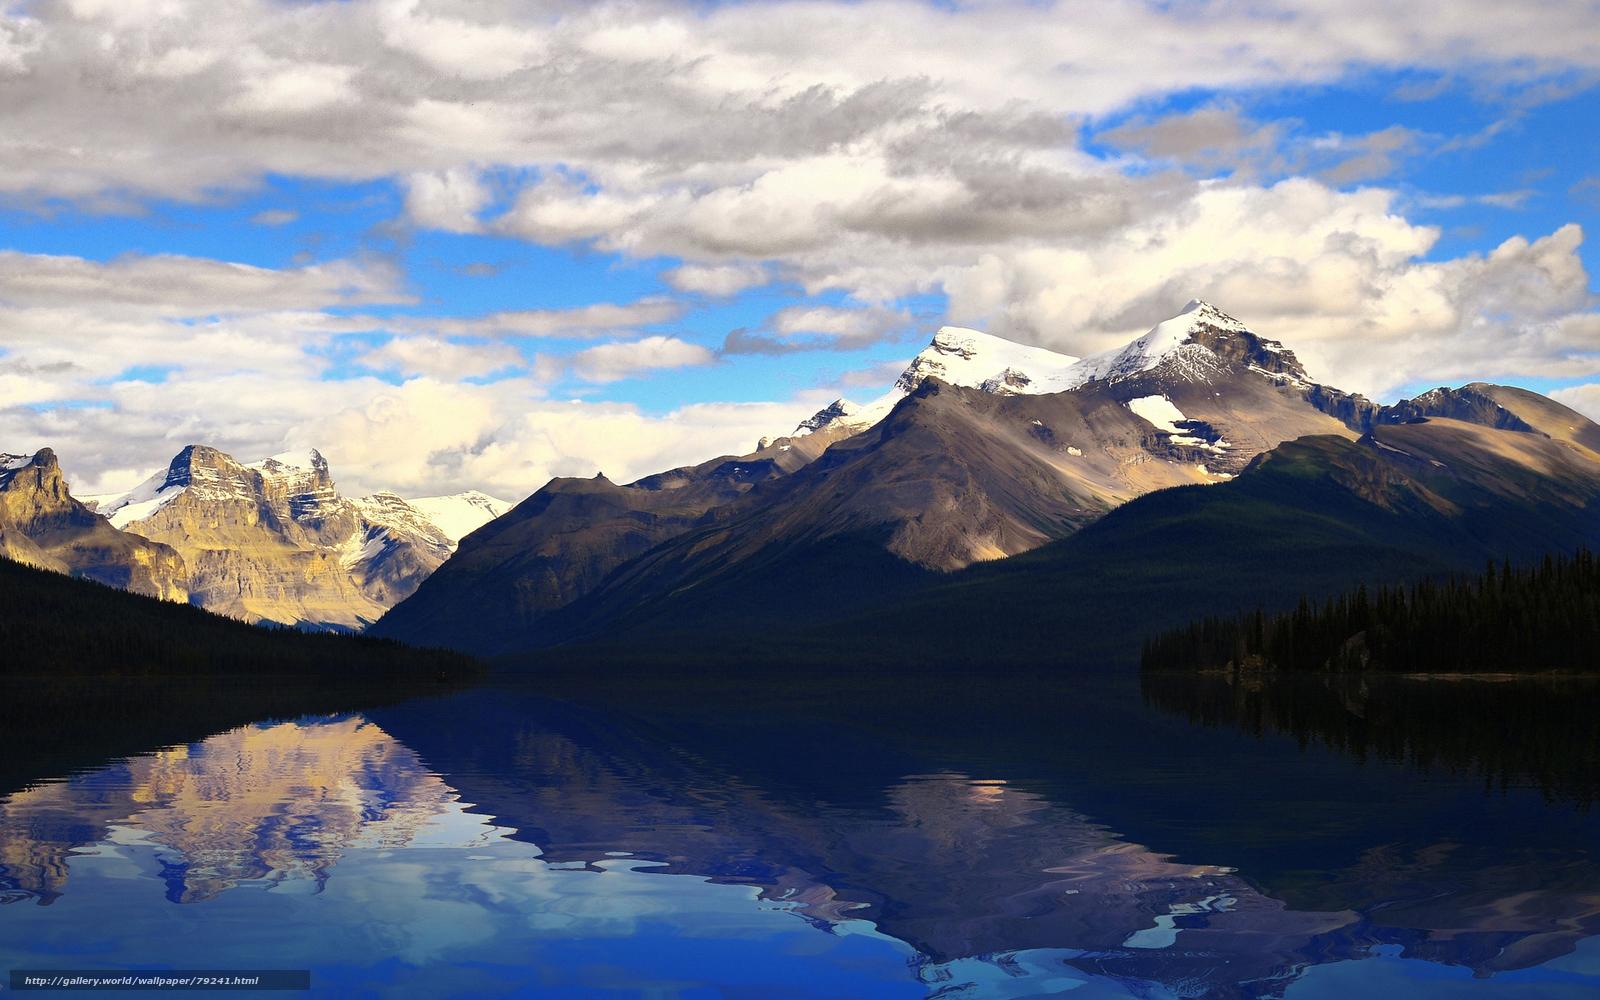 Descargar gratis paisajes papel pintado montaas agua - Papel pintado paisajes ...